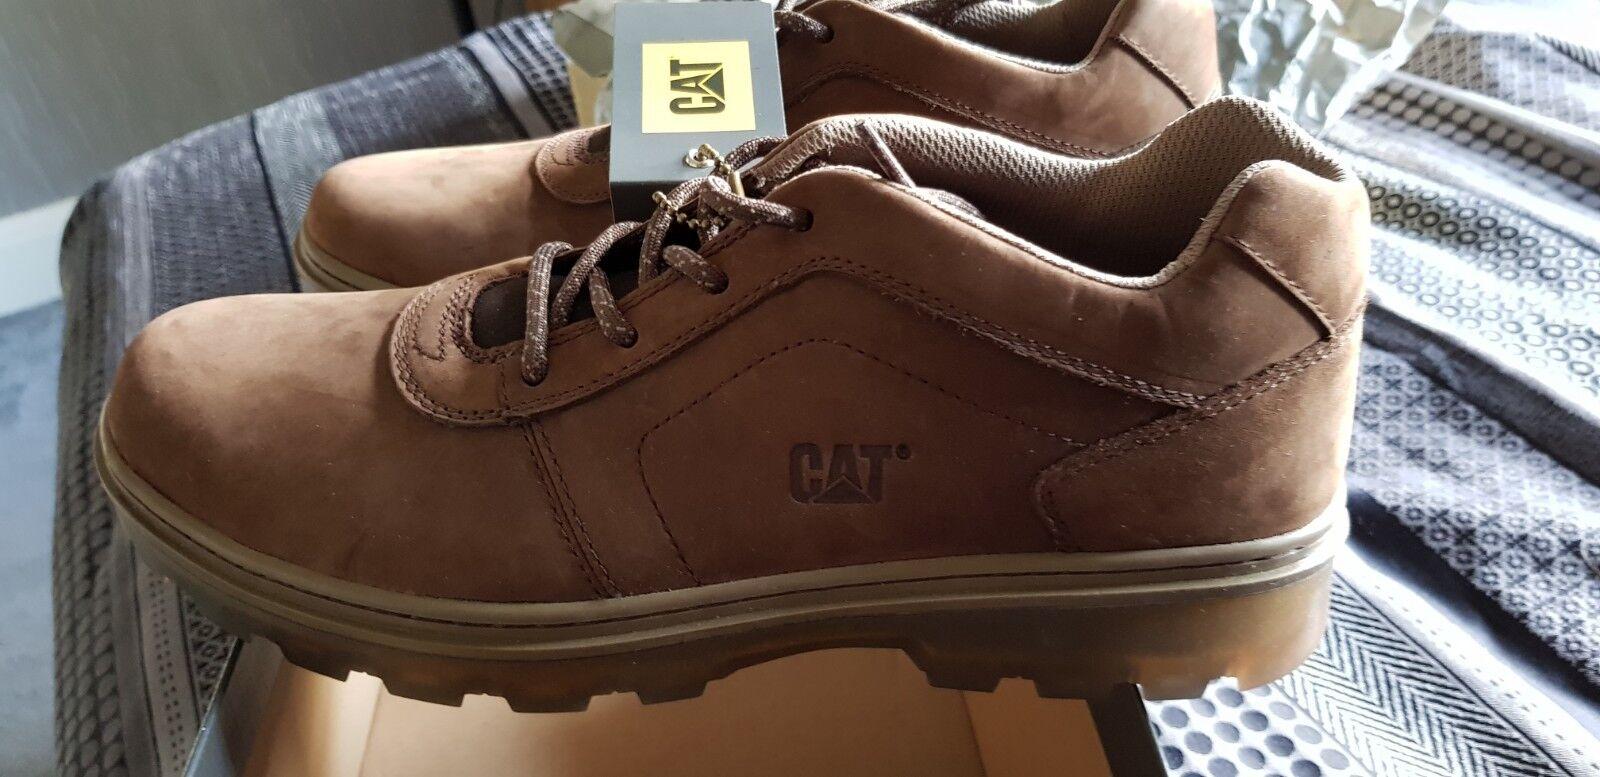 cat radley chaussures, Marron , caterpillar brand taille new en boîte, du chewing - gum seul, taille brand 9, royaume - uni e916fb